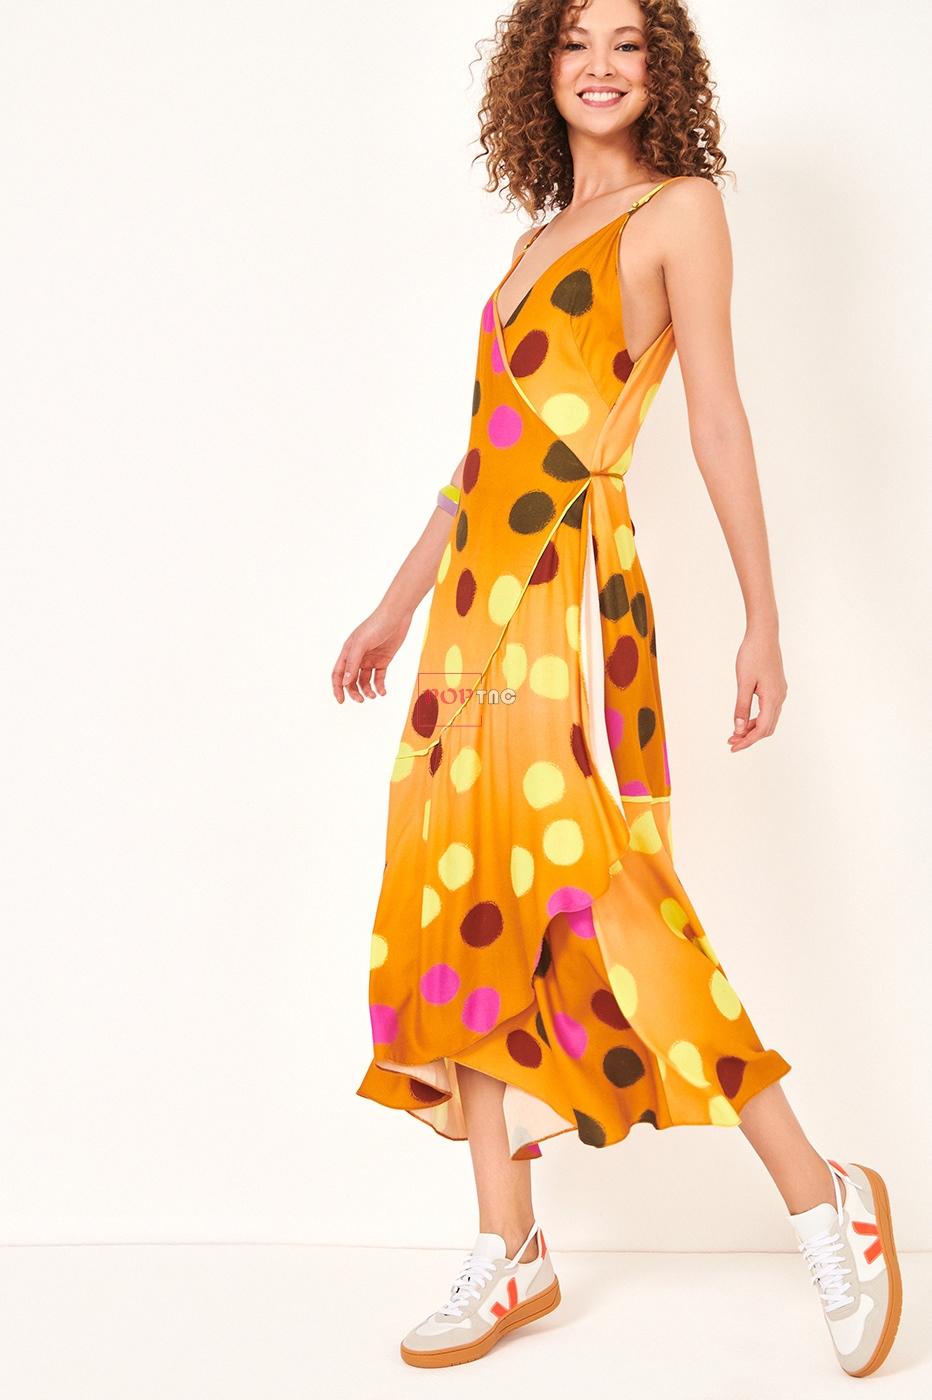 Dress to/ Inverno连衣裙印花设计-POP花型网